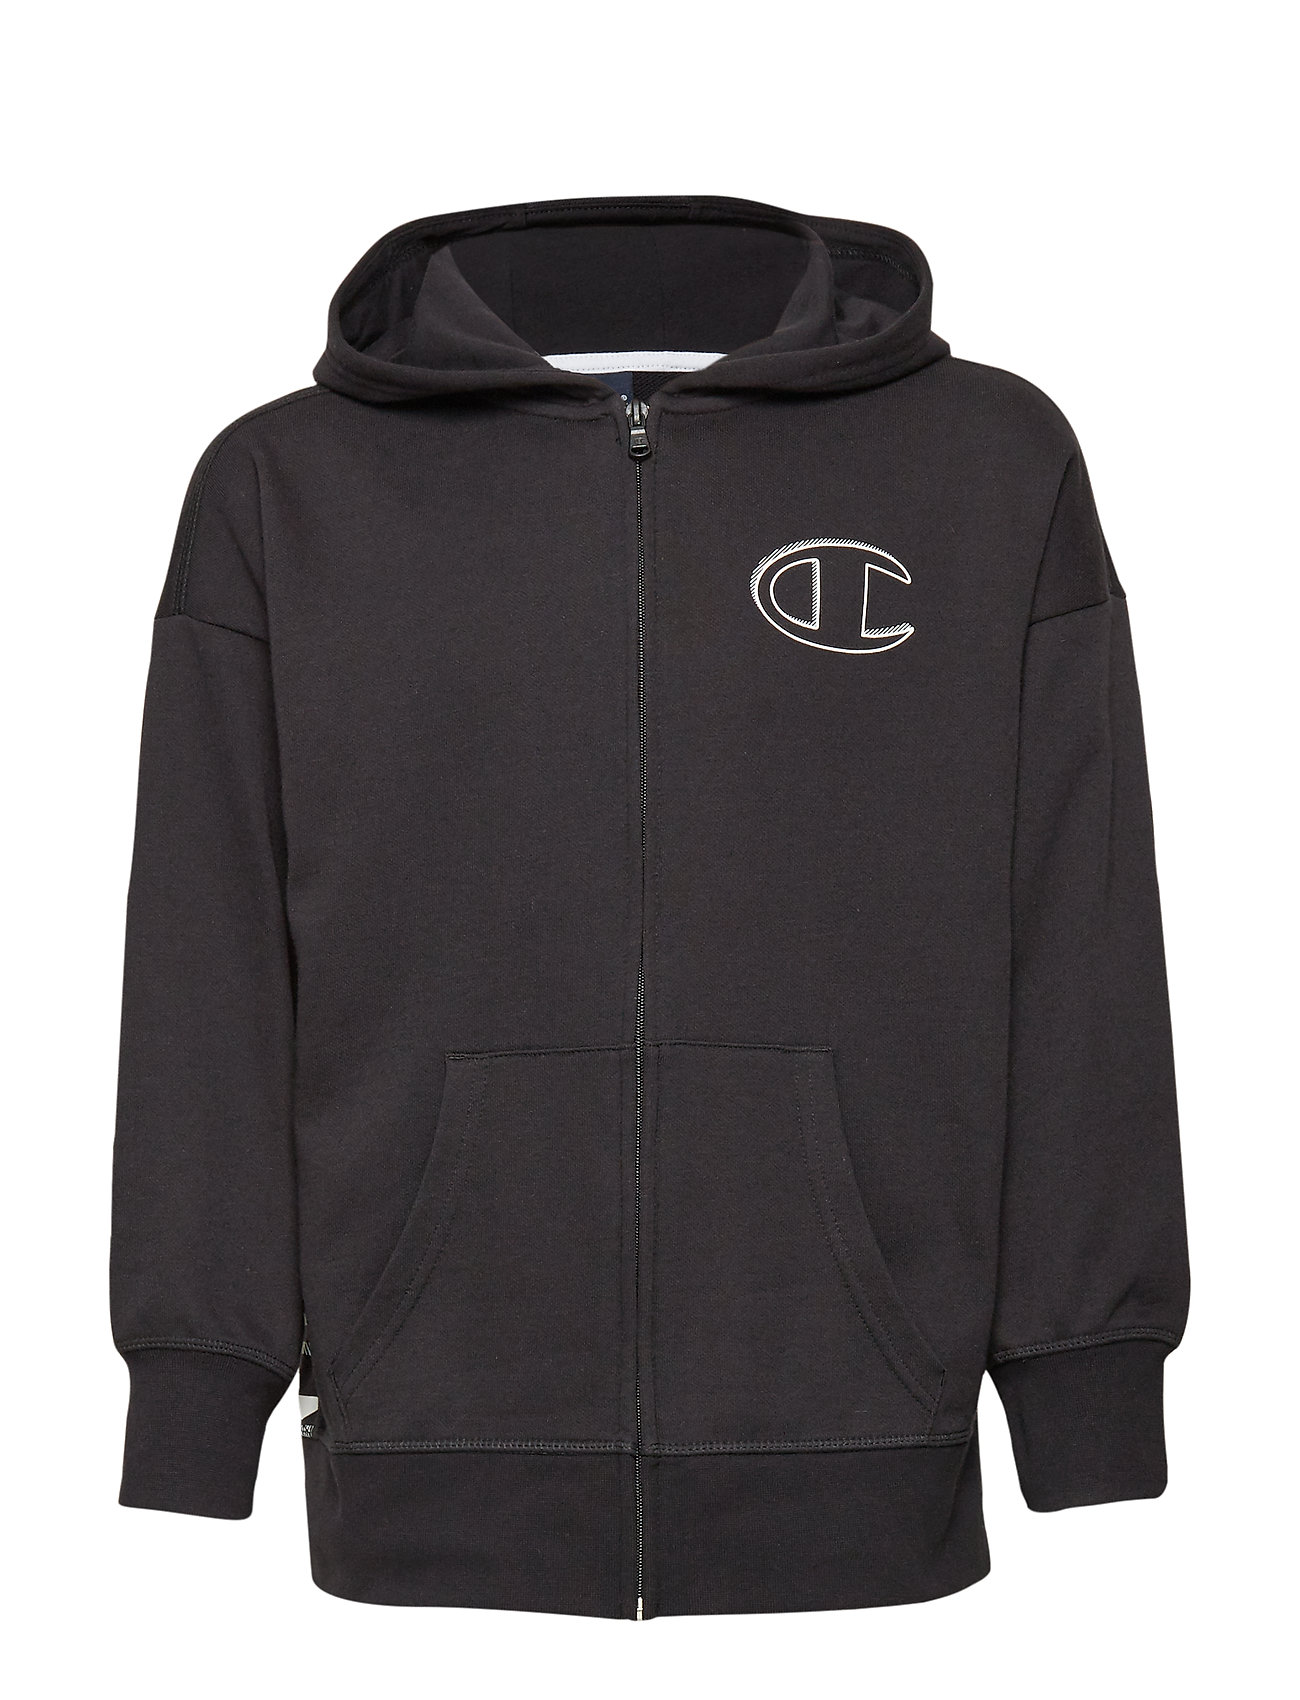 Champion Hooded Full Zip Sweatshirt - BLACK BEAUTY